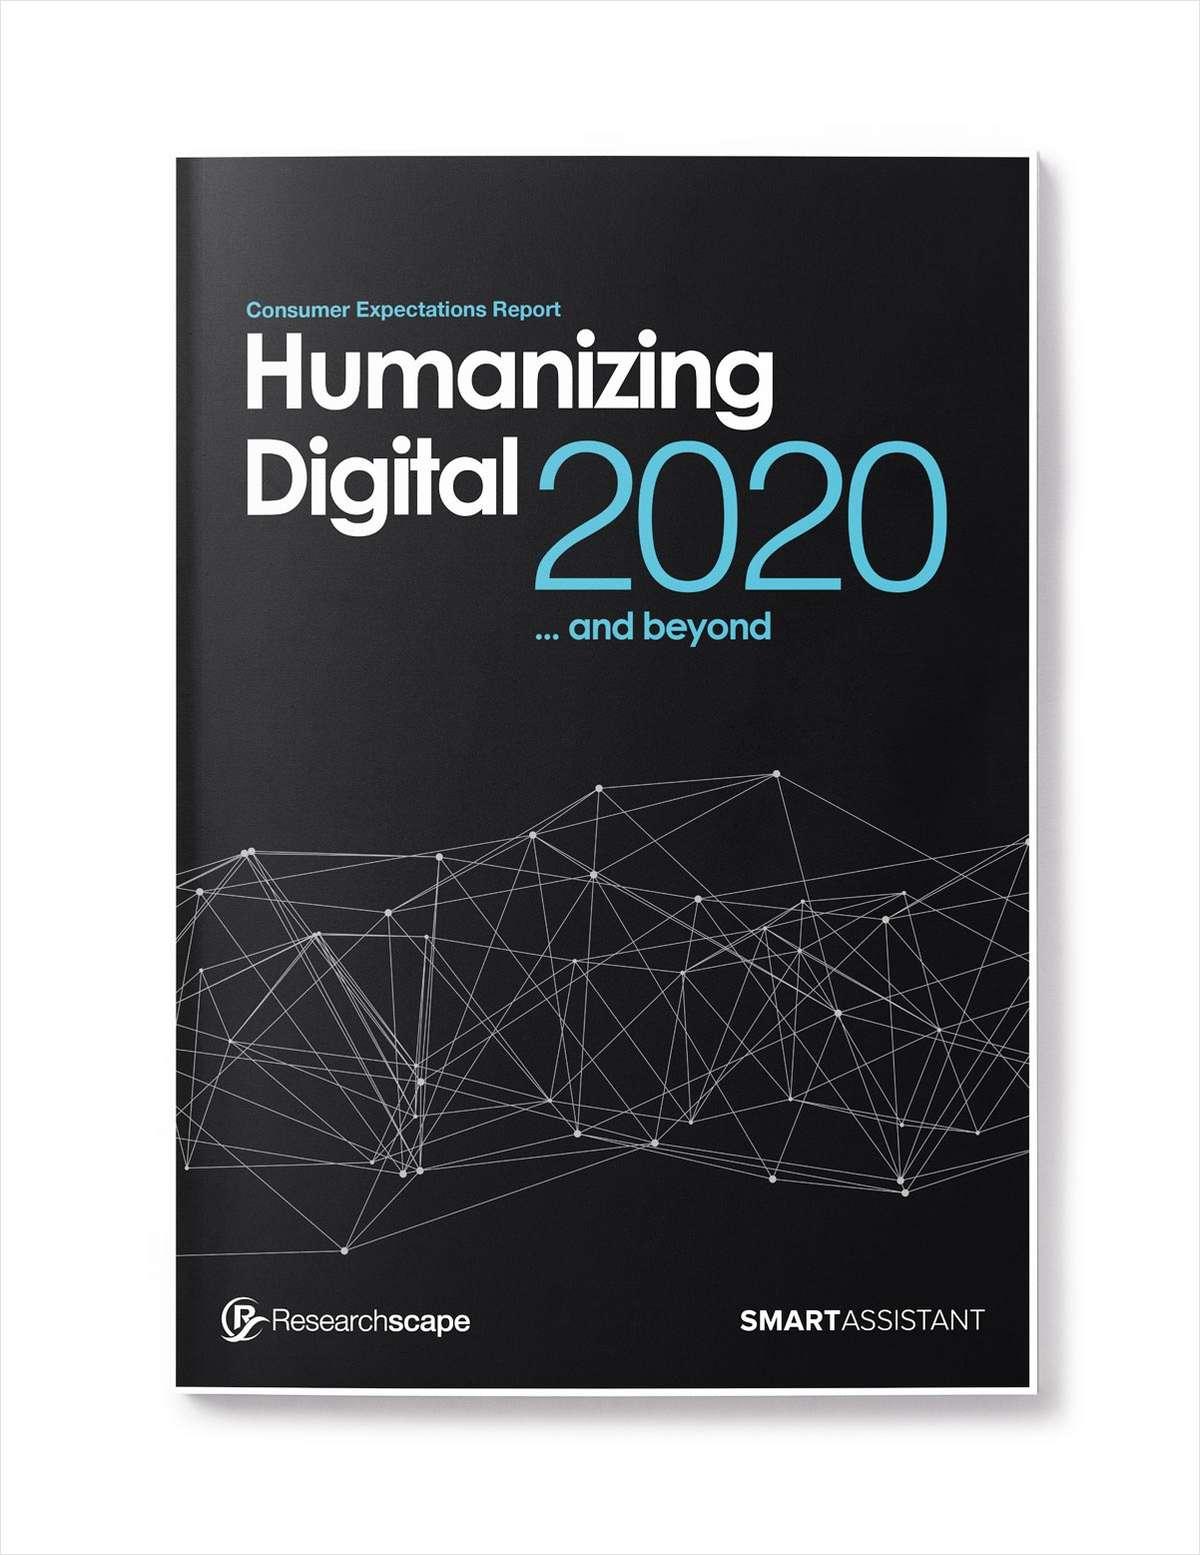 Consumer Expectations Report: Humanizing Digital 2020